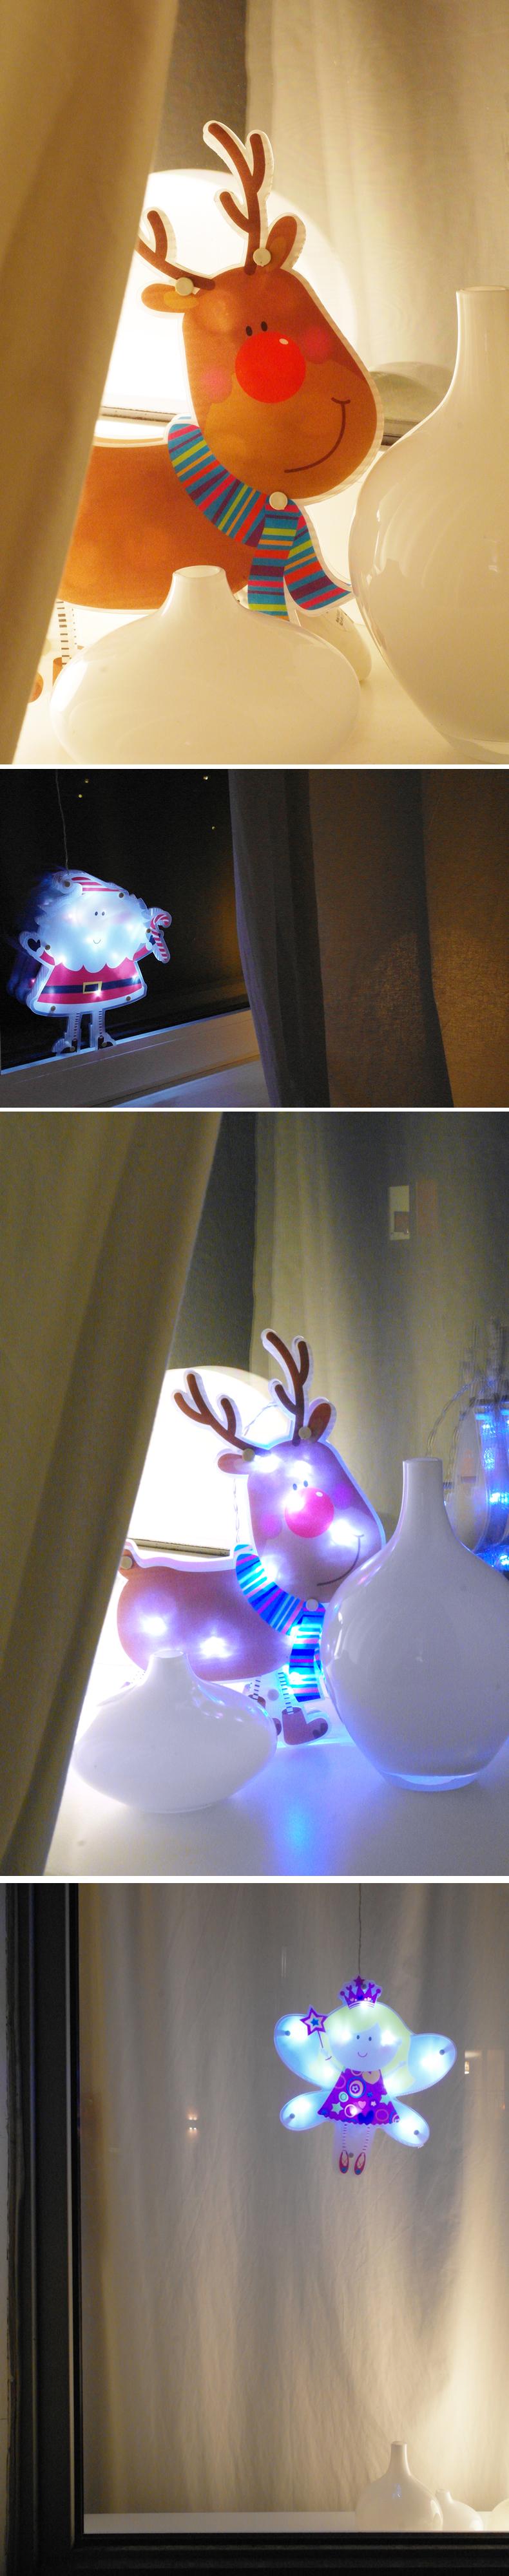 Kinder weihnachtsbeleuchtung fenster lampe fensterbild for Fenster weihnachtsbeleuchtung